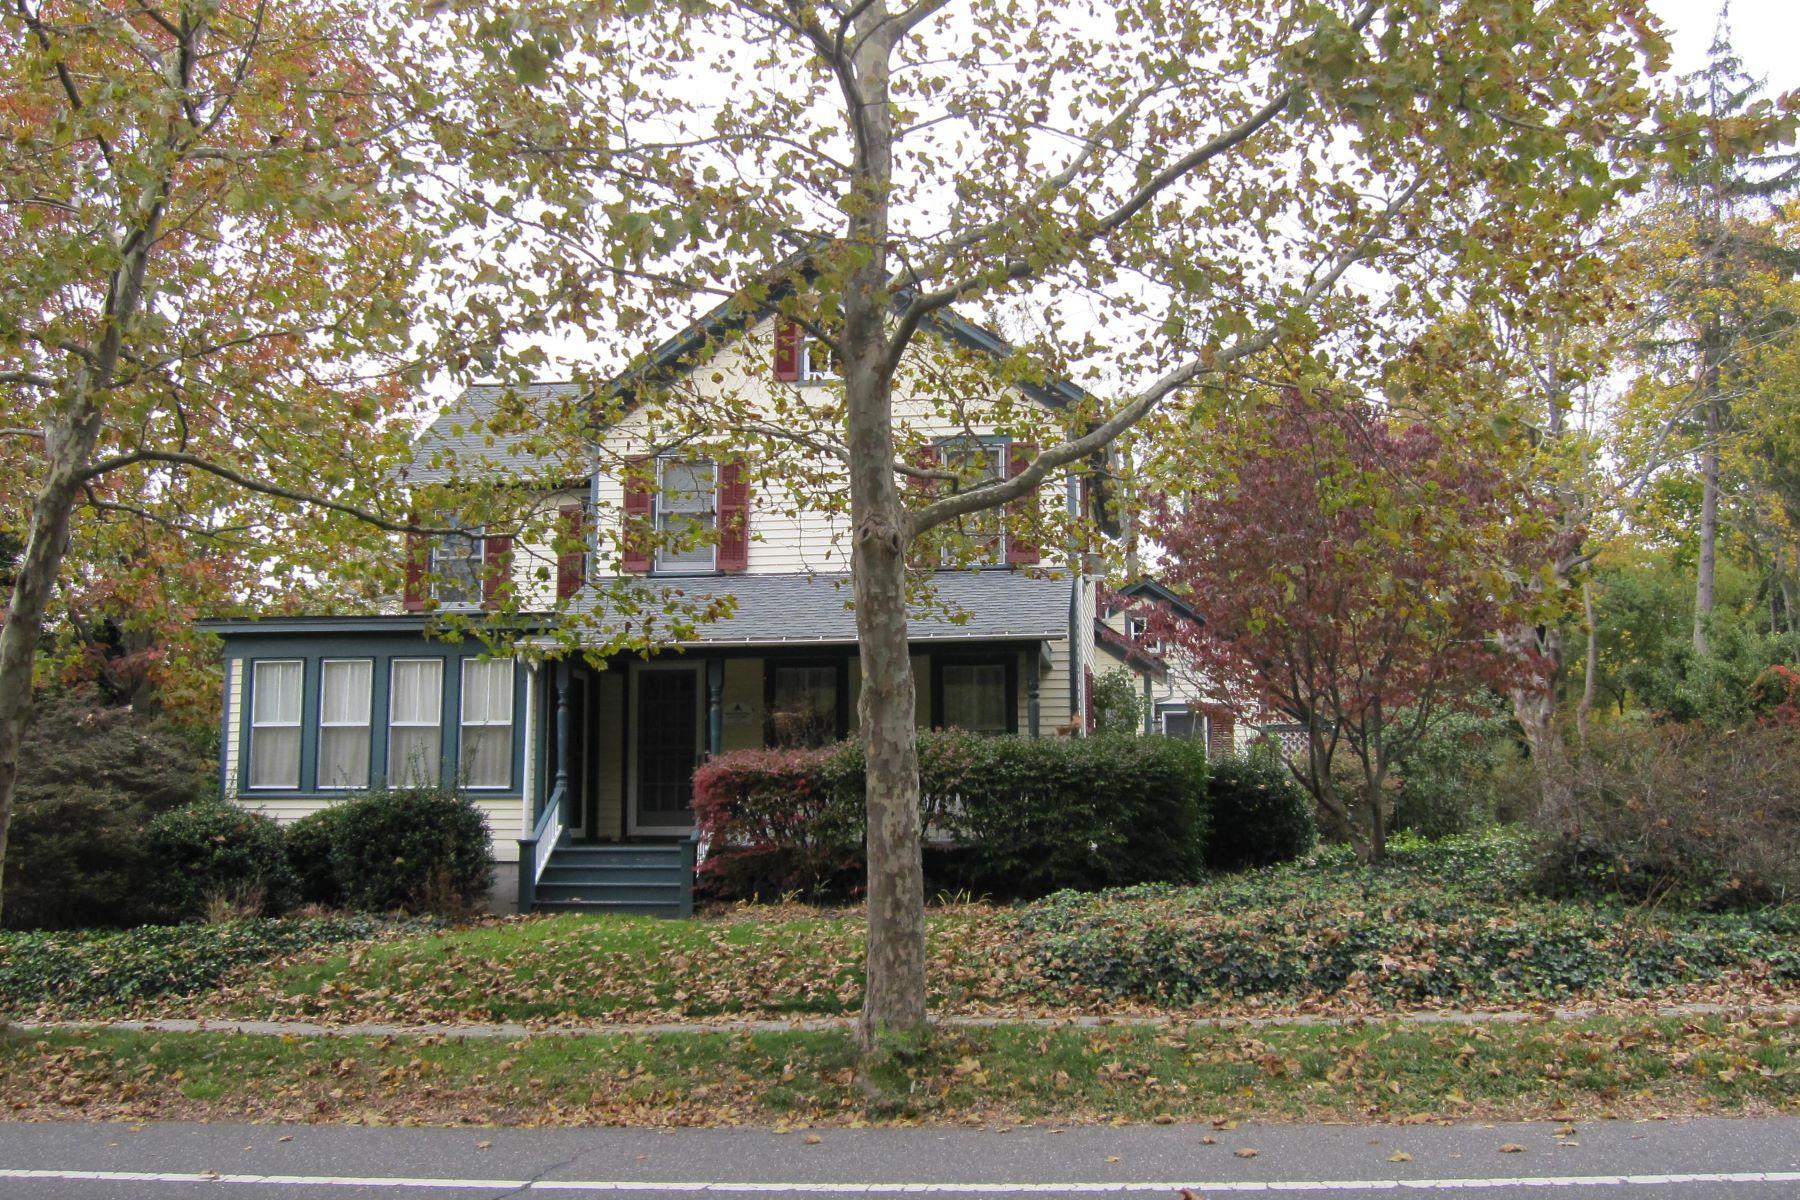 Single Family Home for Sale at Setauket Village Historic Gem 107 Main St Setauket, New York, 11733 United States